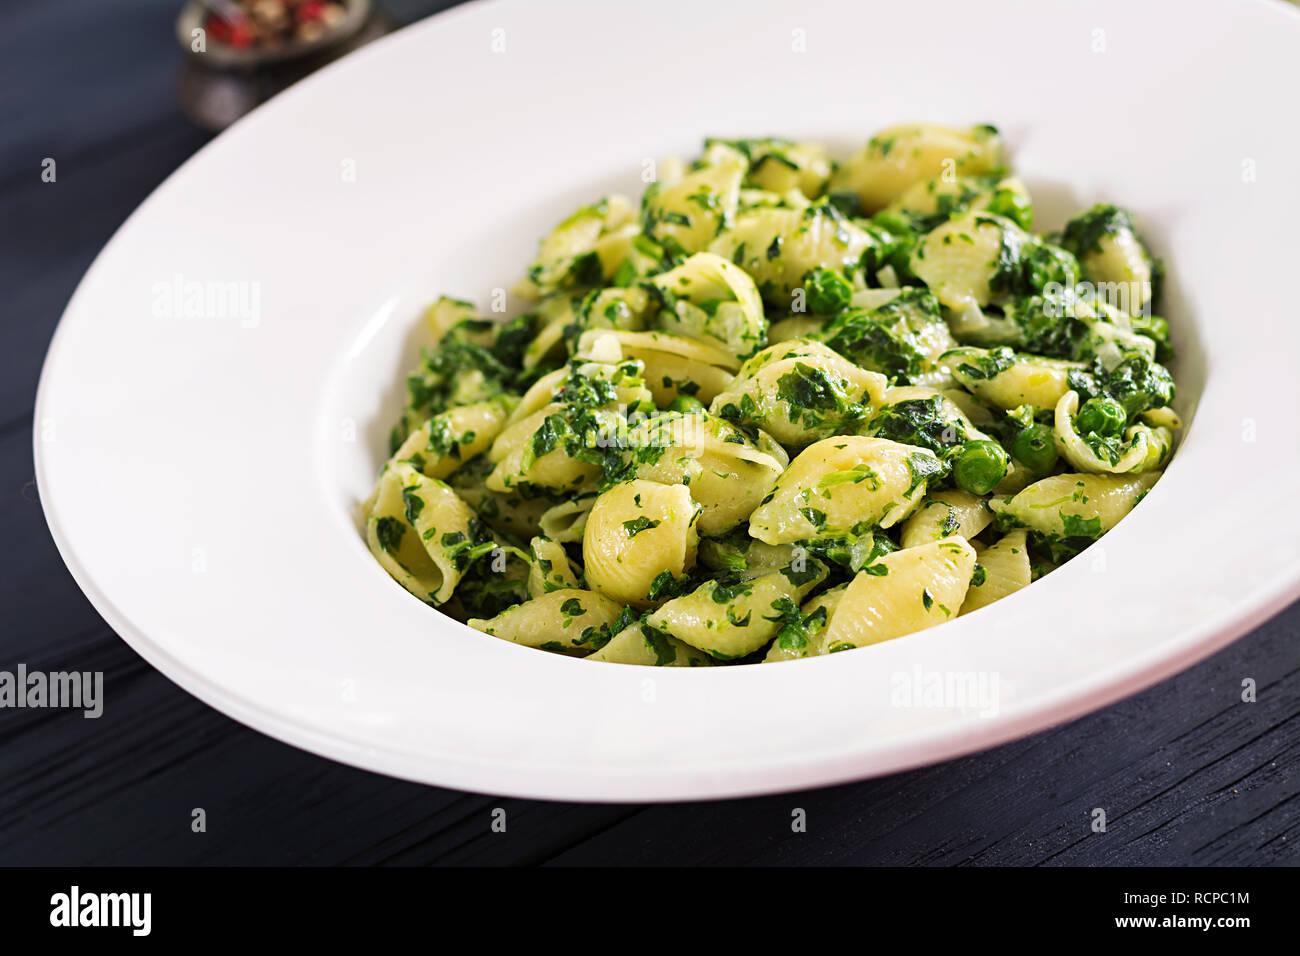 Conchiglie pasta with spinach and green pea pesto. Italian Cuisine. Vegan food. Stock Photo